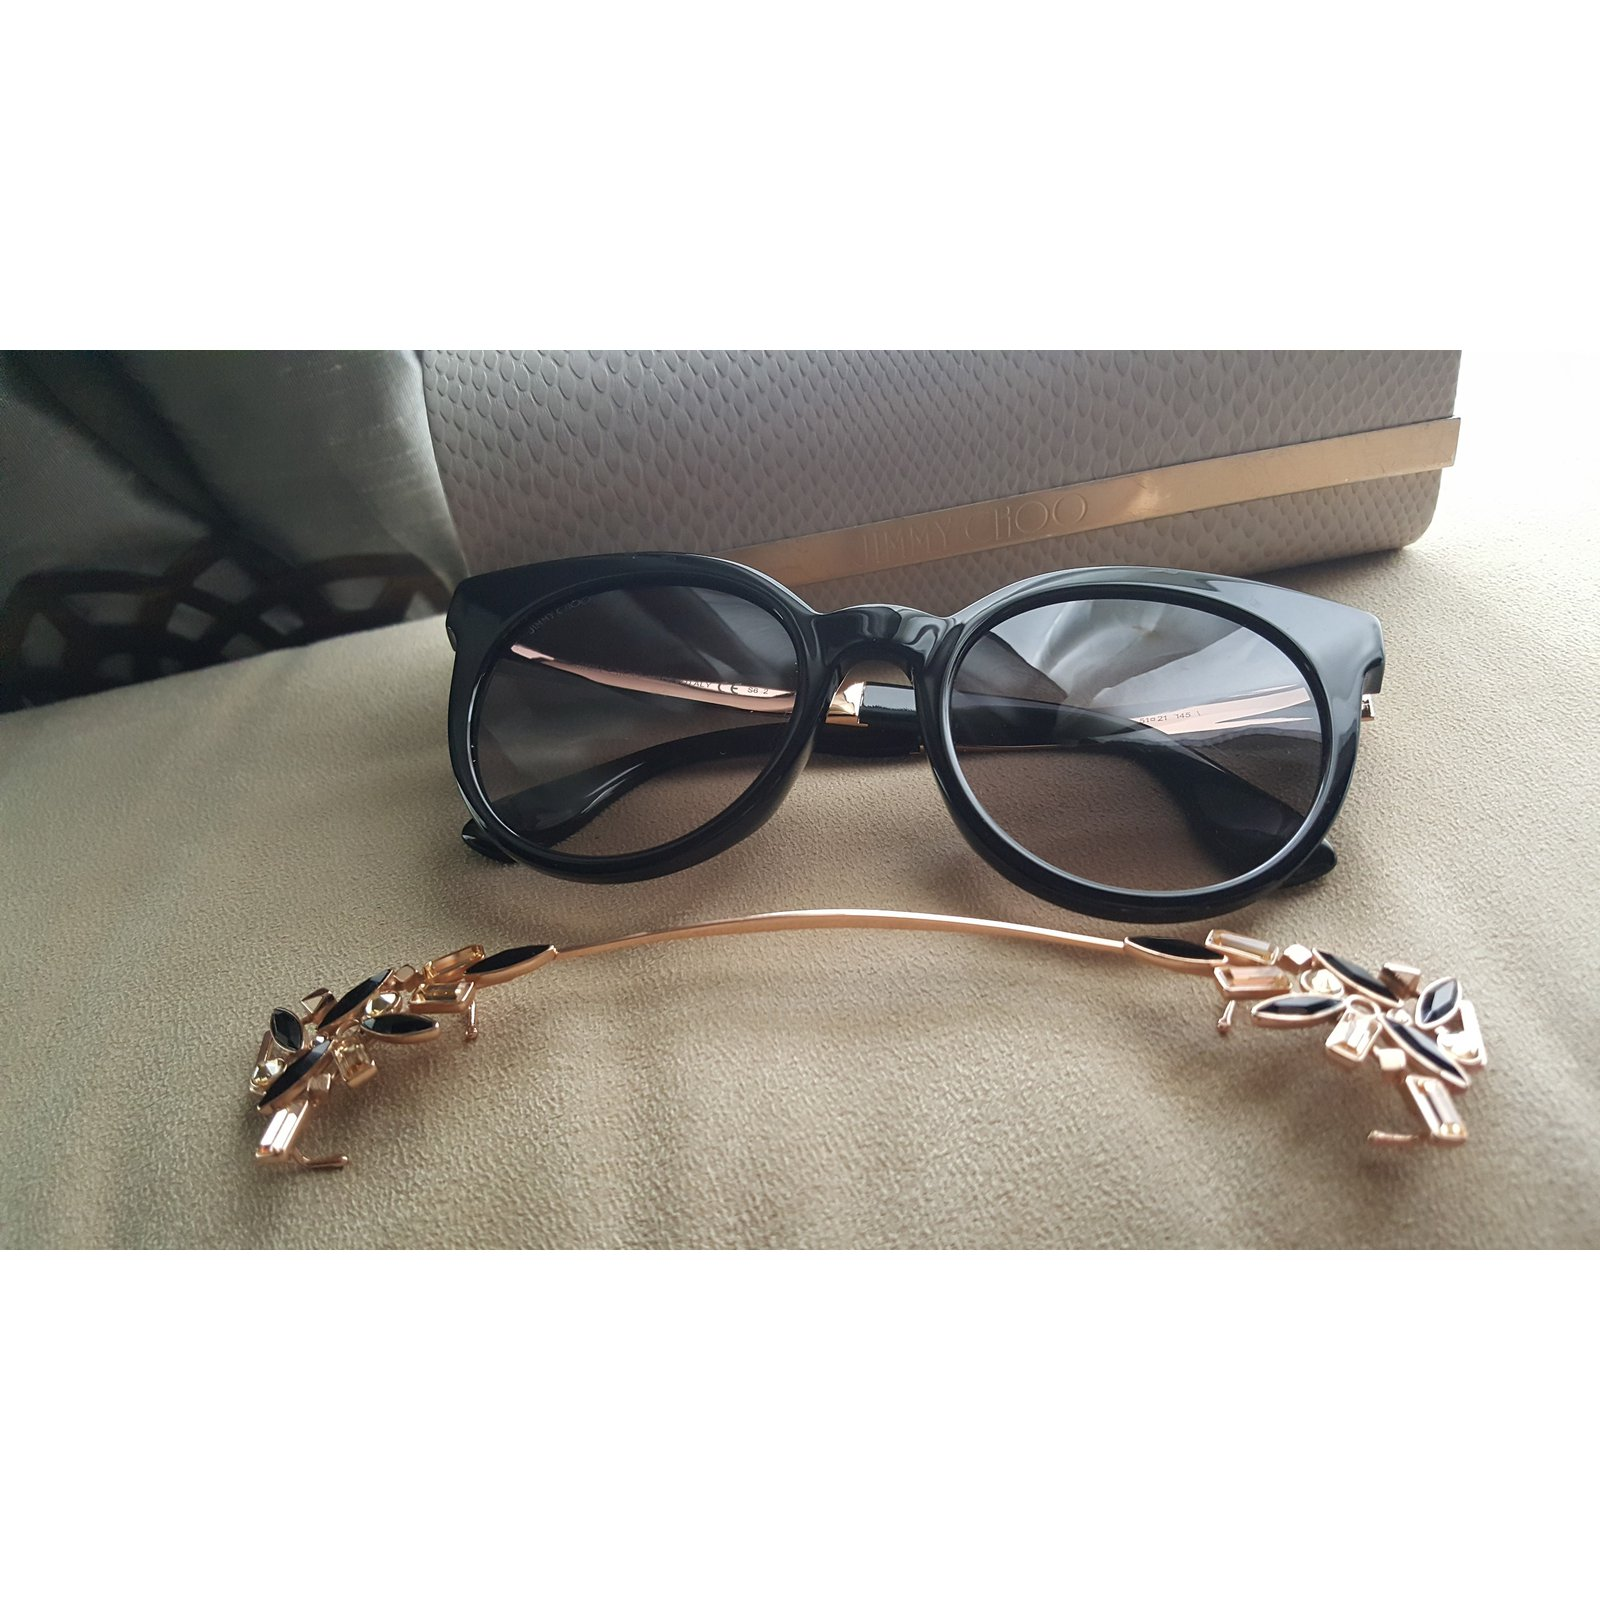 6c5e548e6e10 Jimmy Choo VIVY Sunglasses Acetate Black ref.74536 - Joli Closet